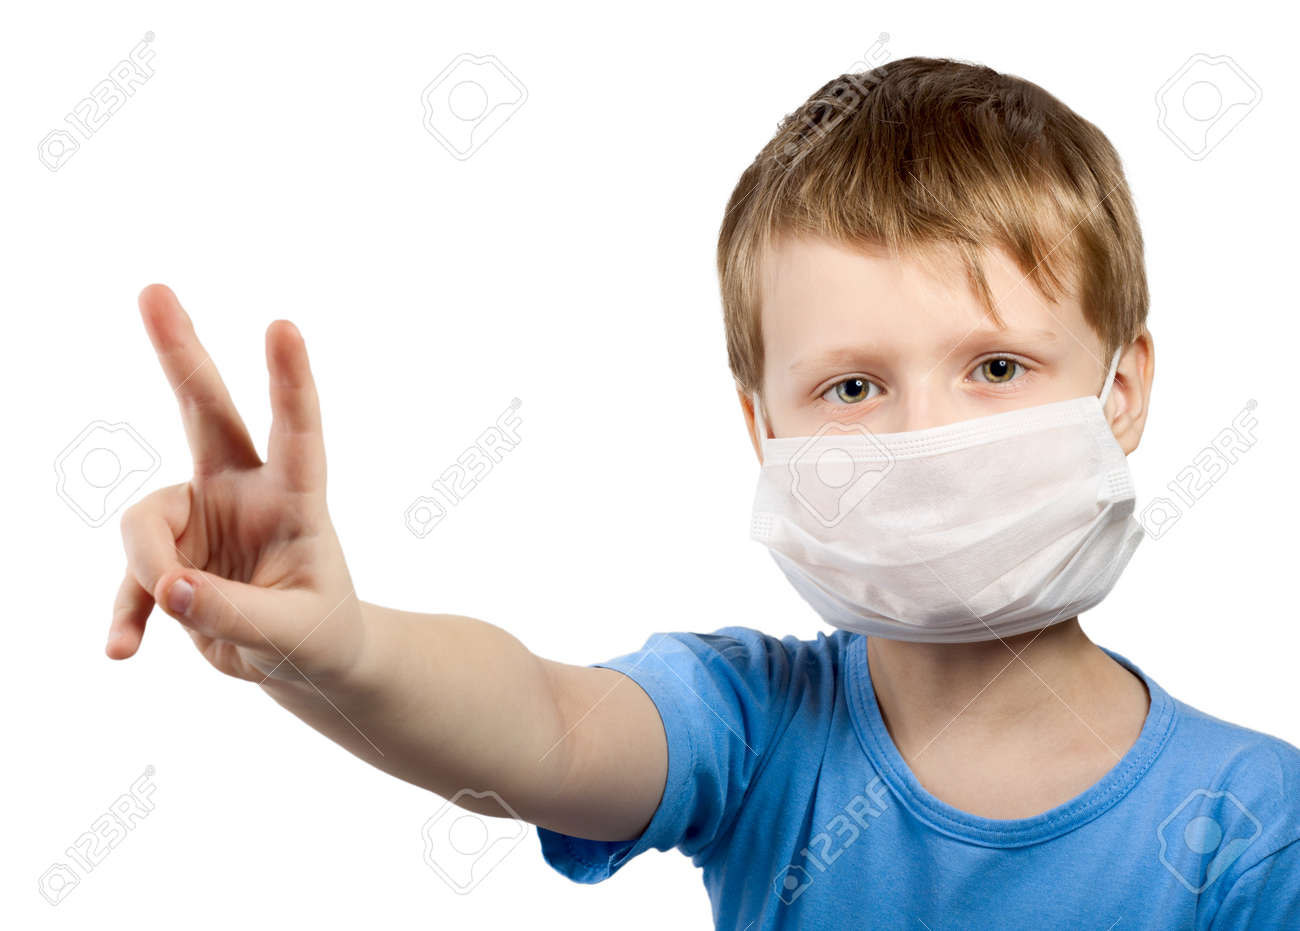 masques chirurgicaux enfants